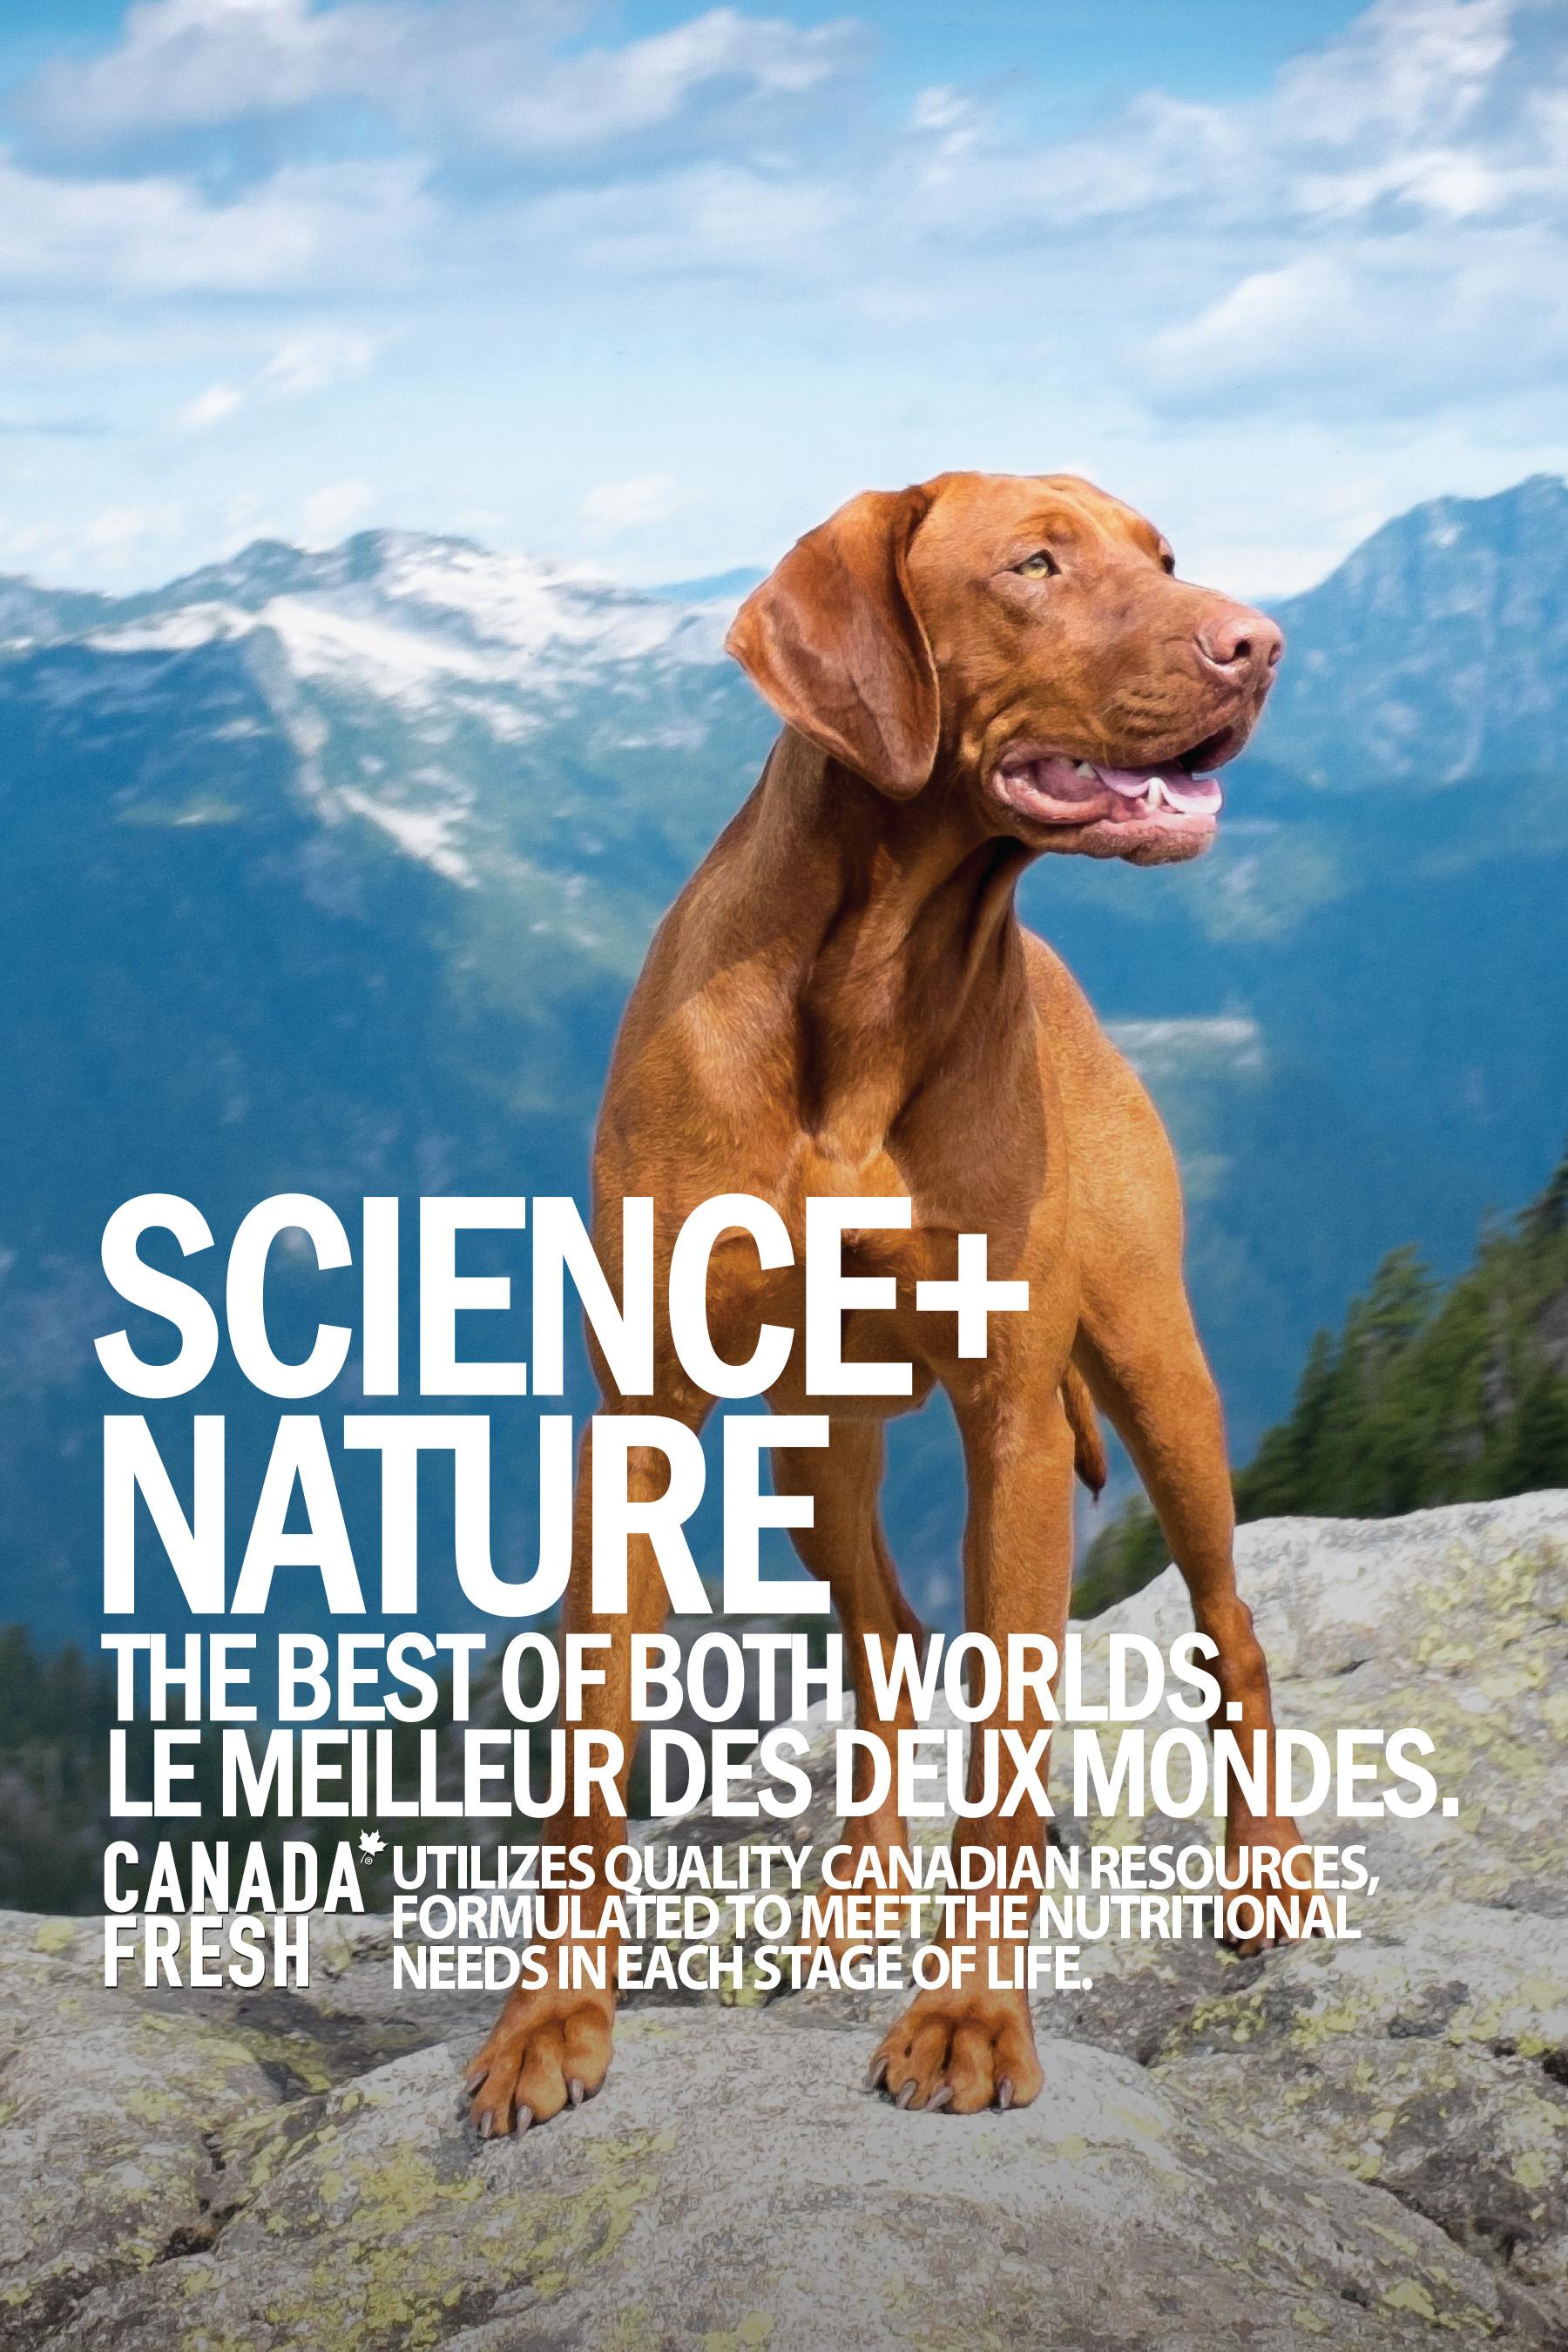 SCIENCE+NATURE.jpg